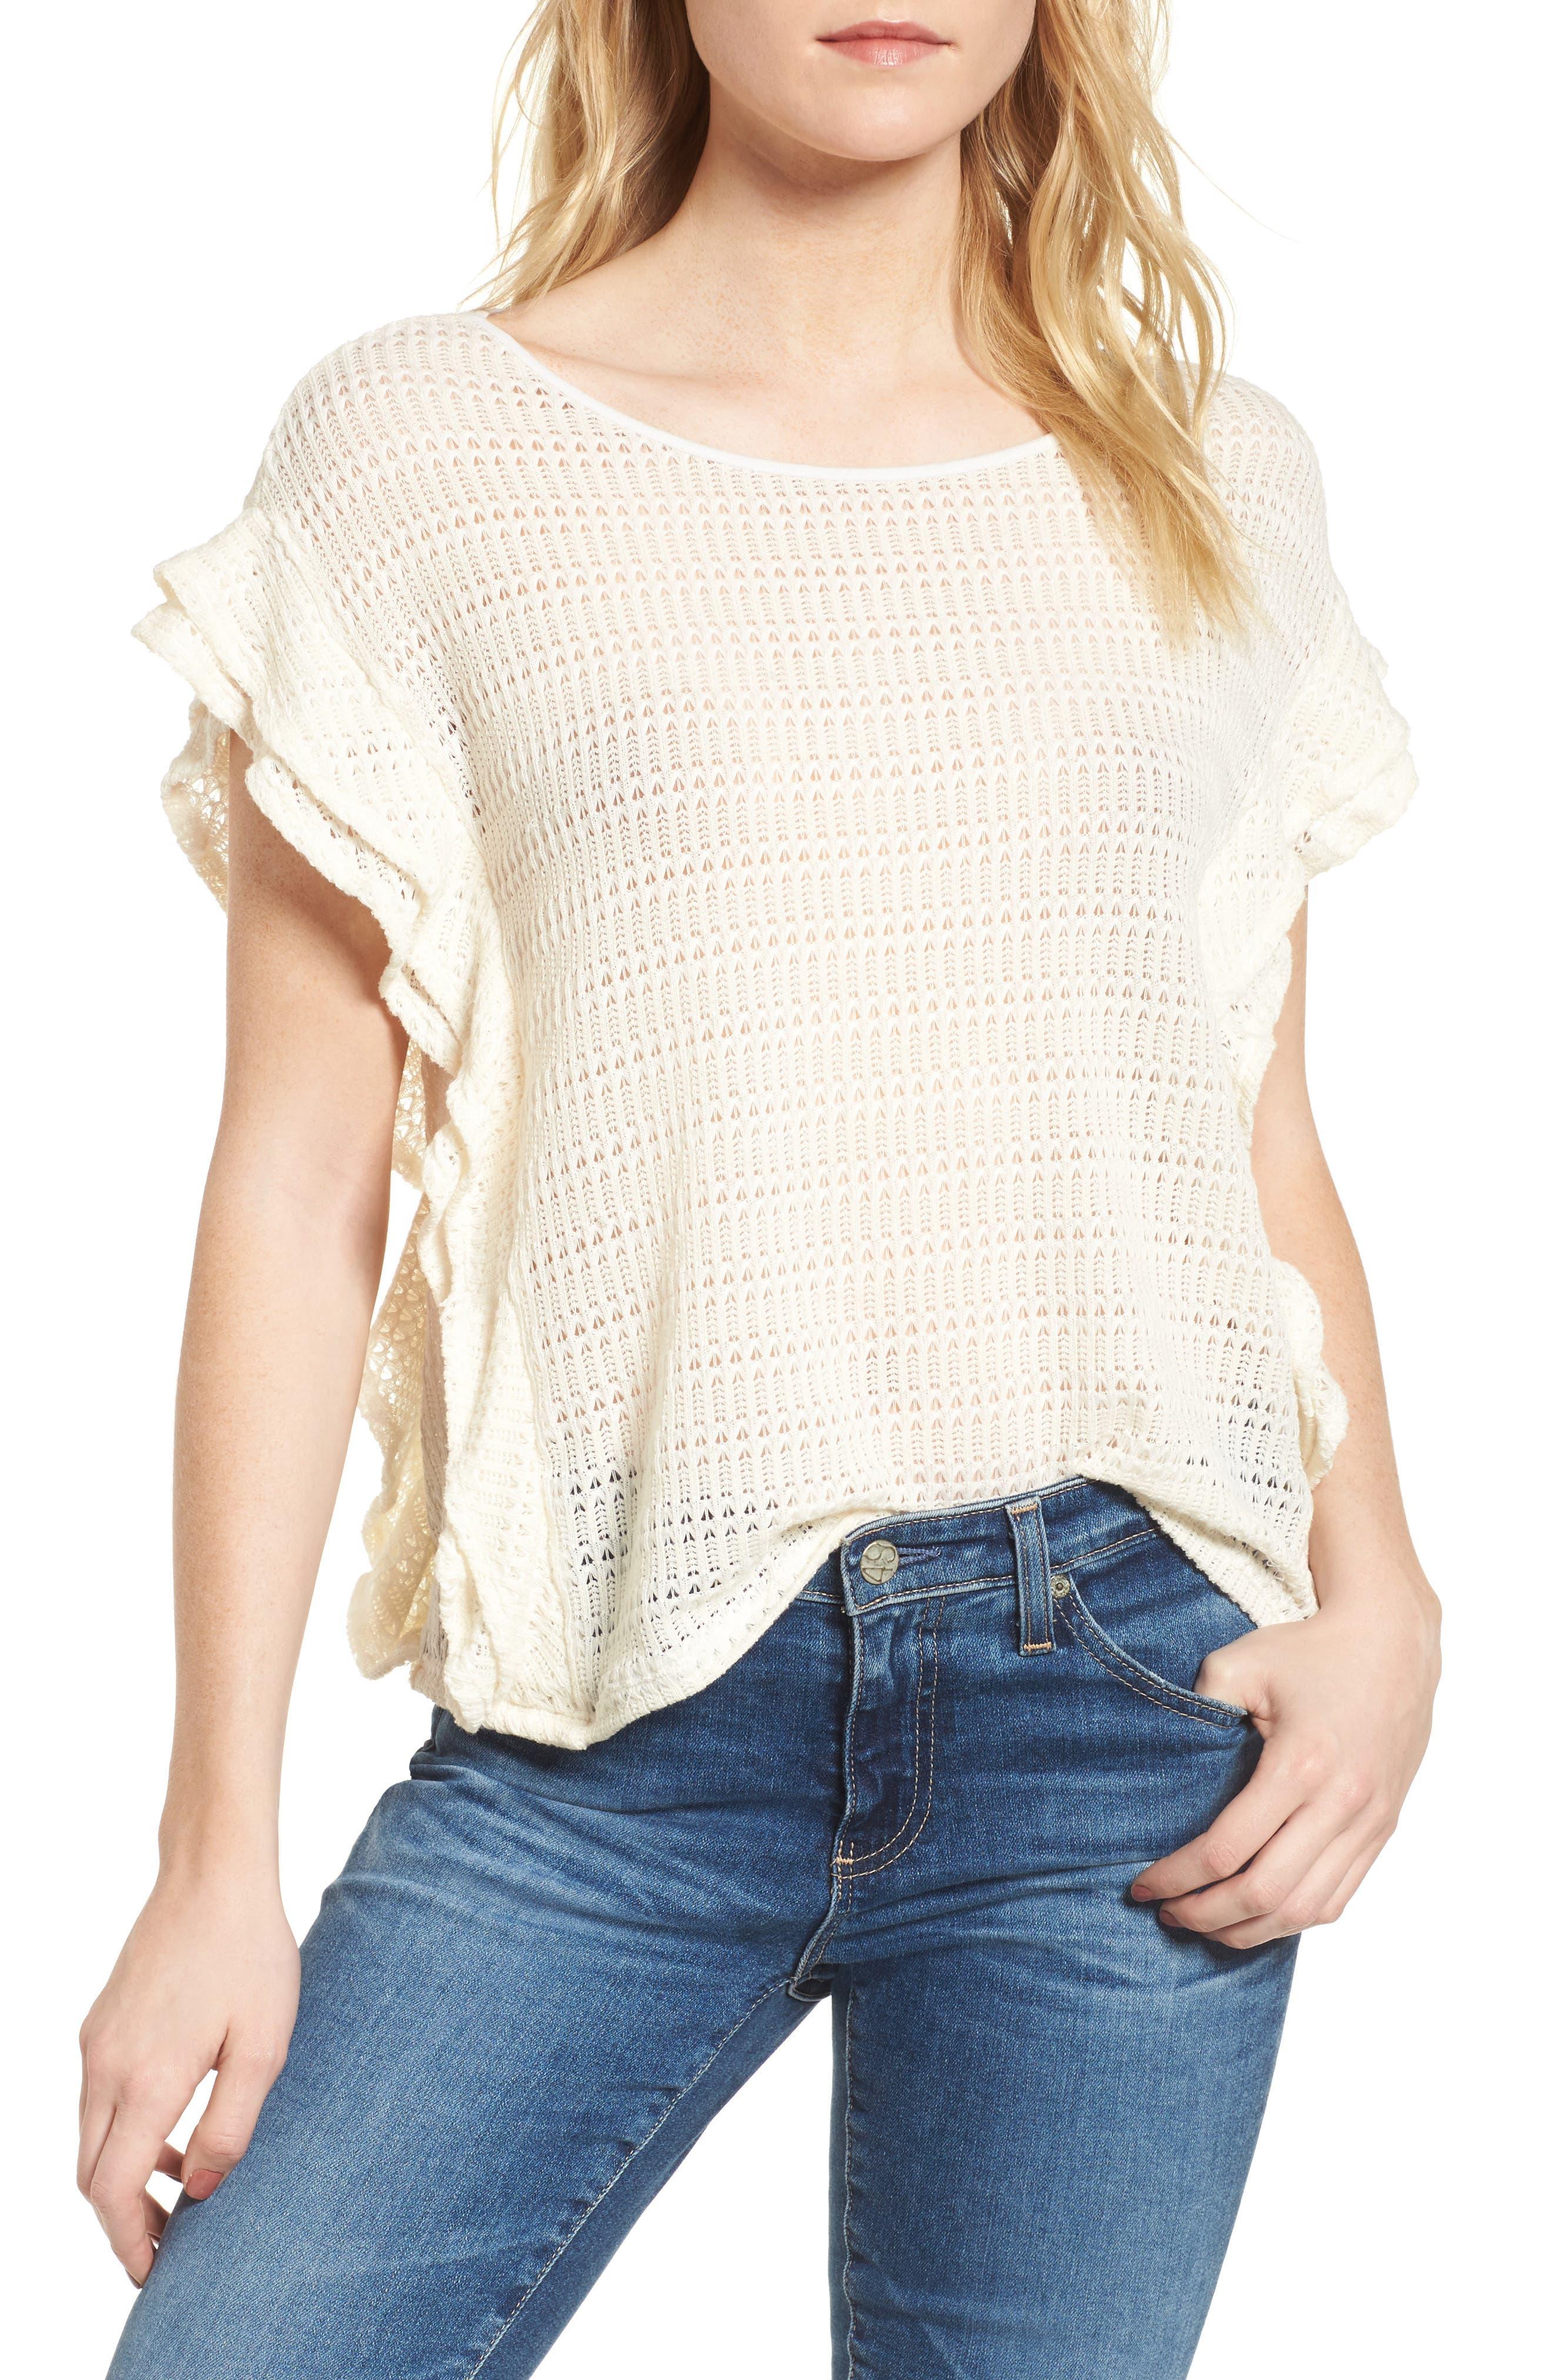 Main Image - Ella Moss Crochet Pullover Top